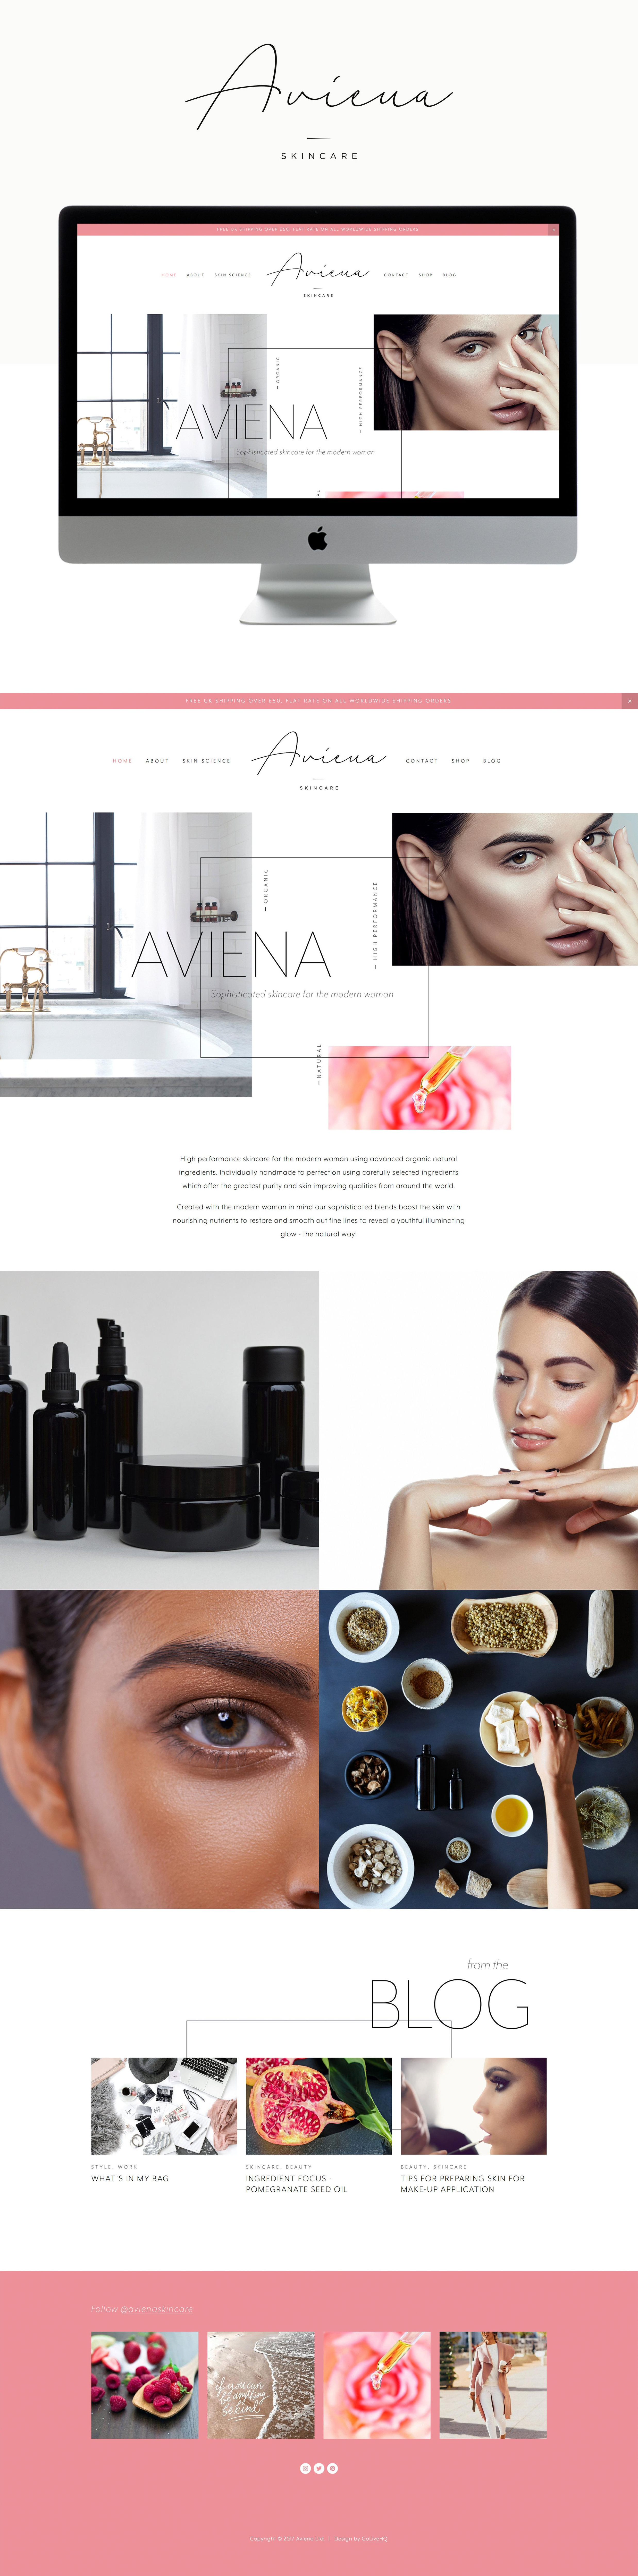 clean, modern, bold Squarespace website design | designed by: golivehq.co